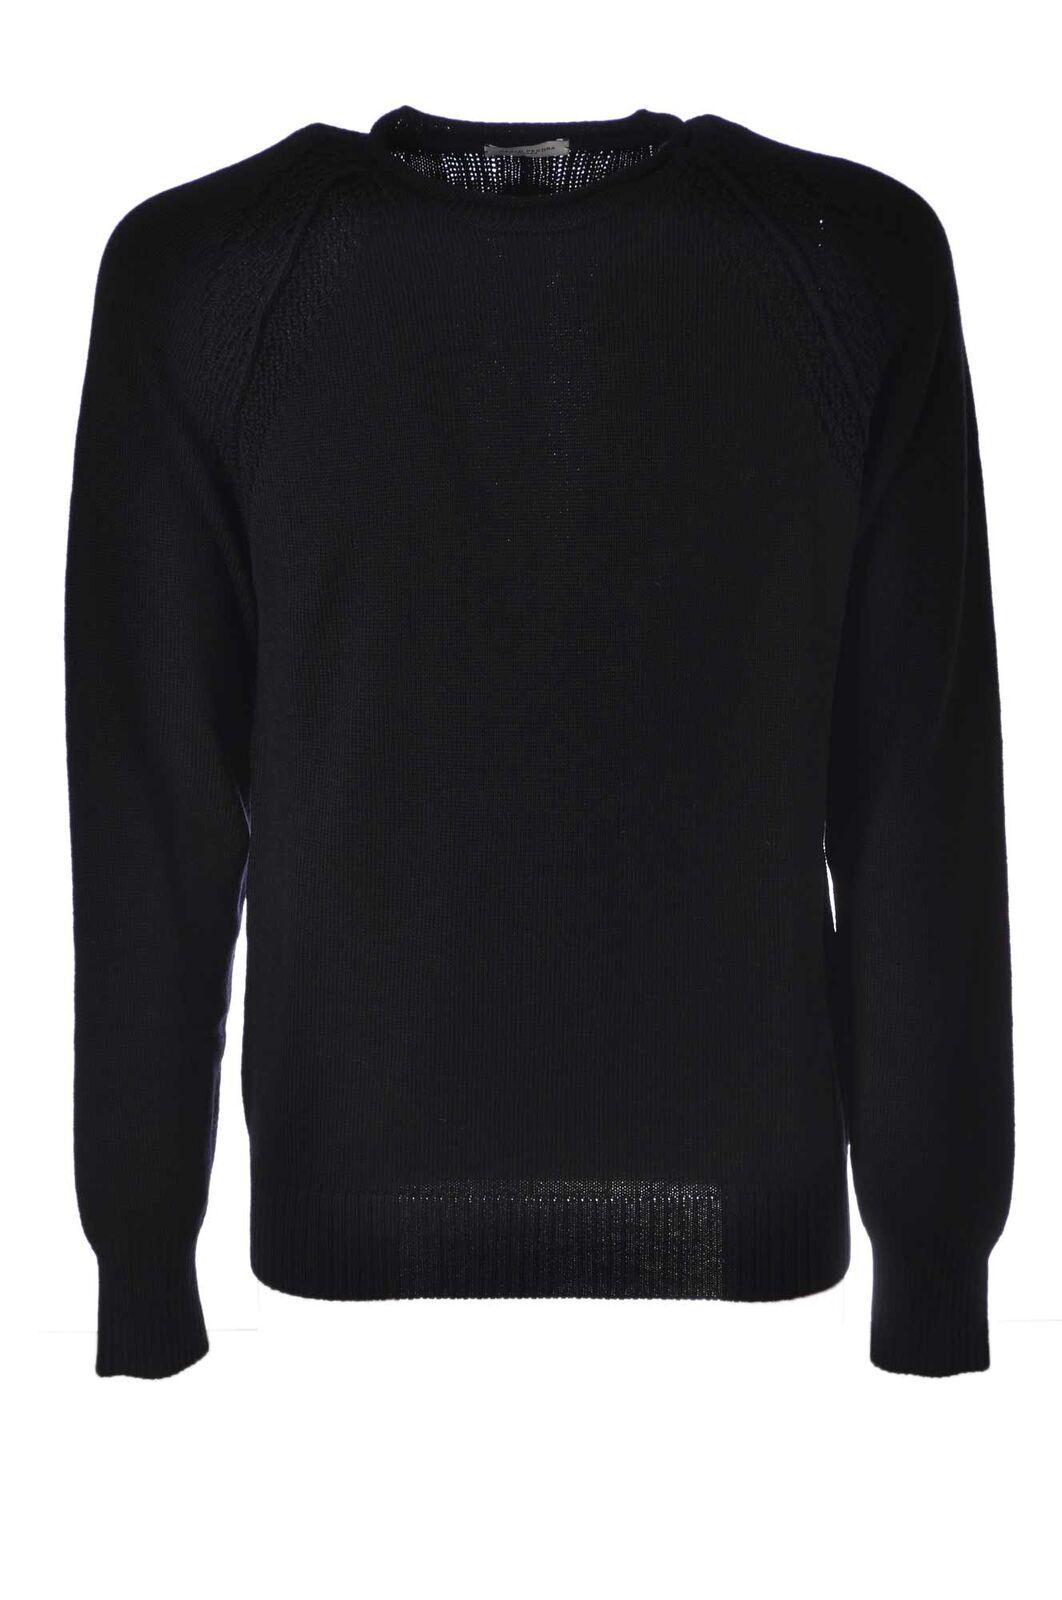 Paolo Pecora - Knitwear-Sweaters - Man - Blau - 4384913A190752